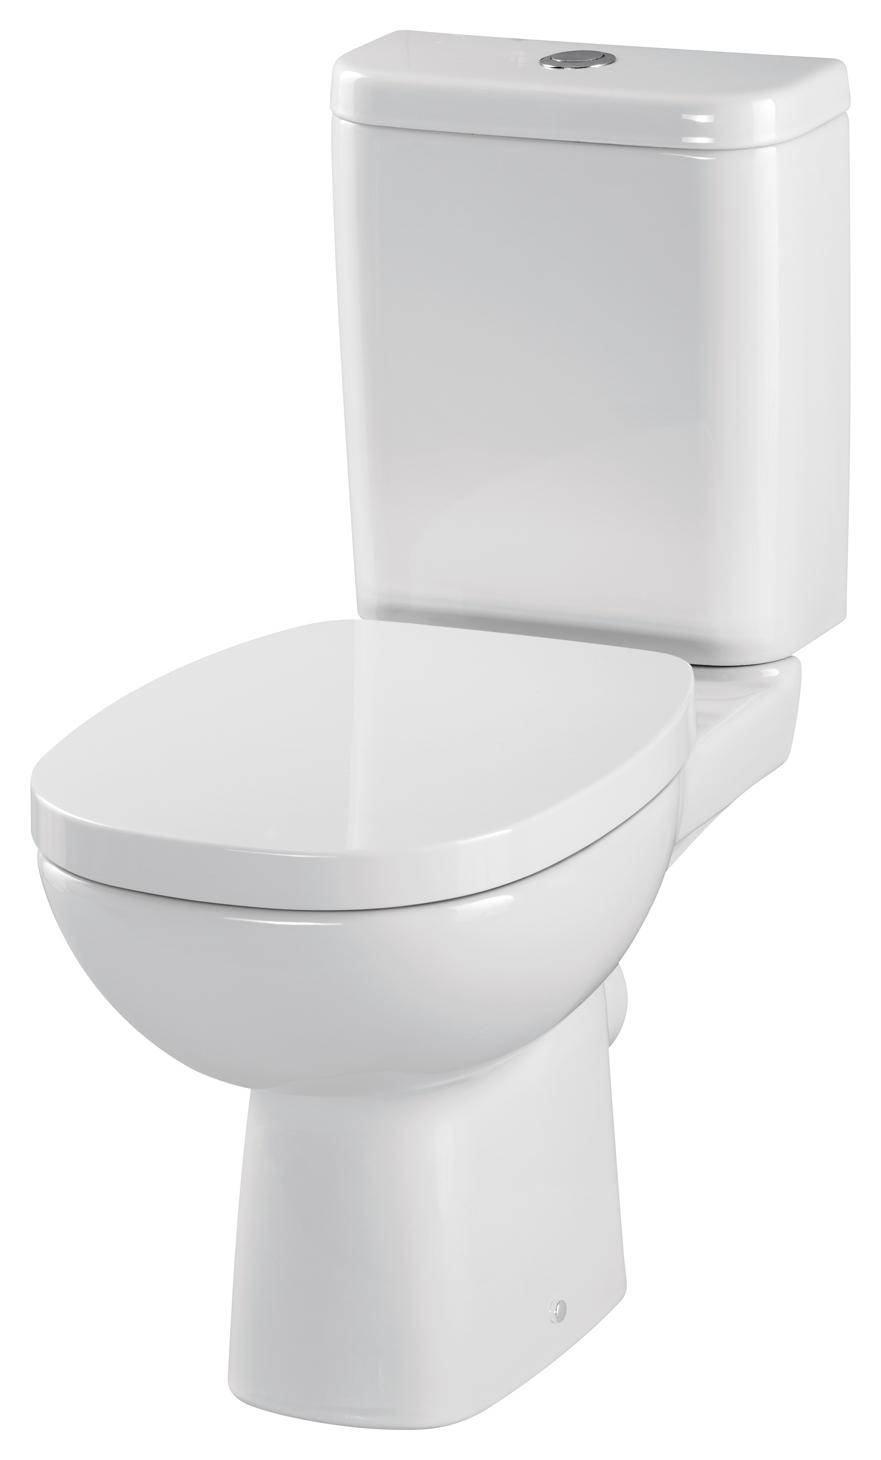 domino keramik stand wc toilette 52962 tiefsp ler bodenstehend ebay. Black Bedroom Furniture Sets. Home Design Ideas